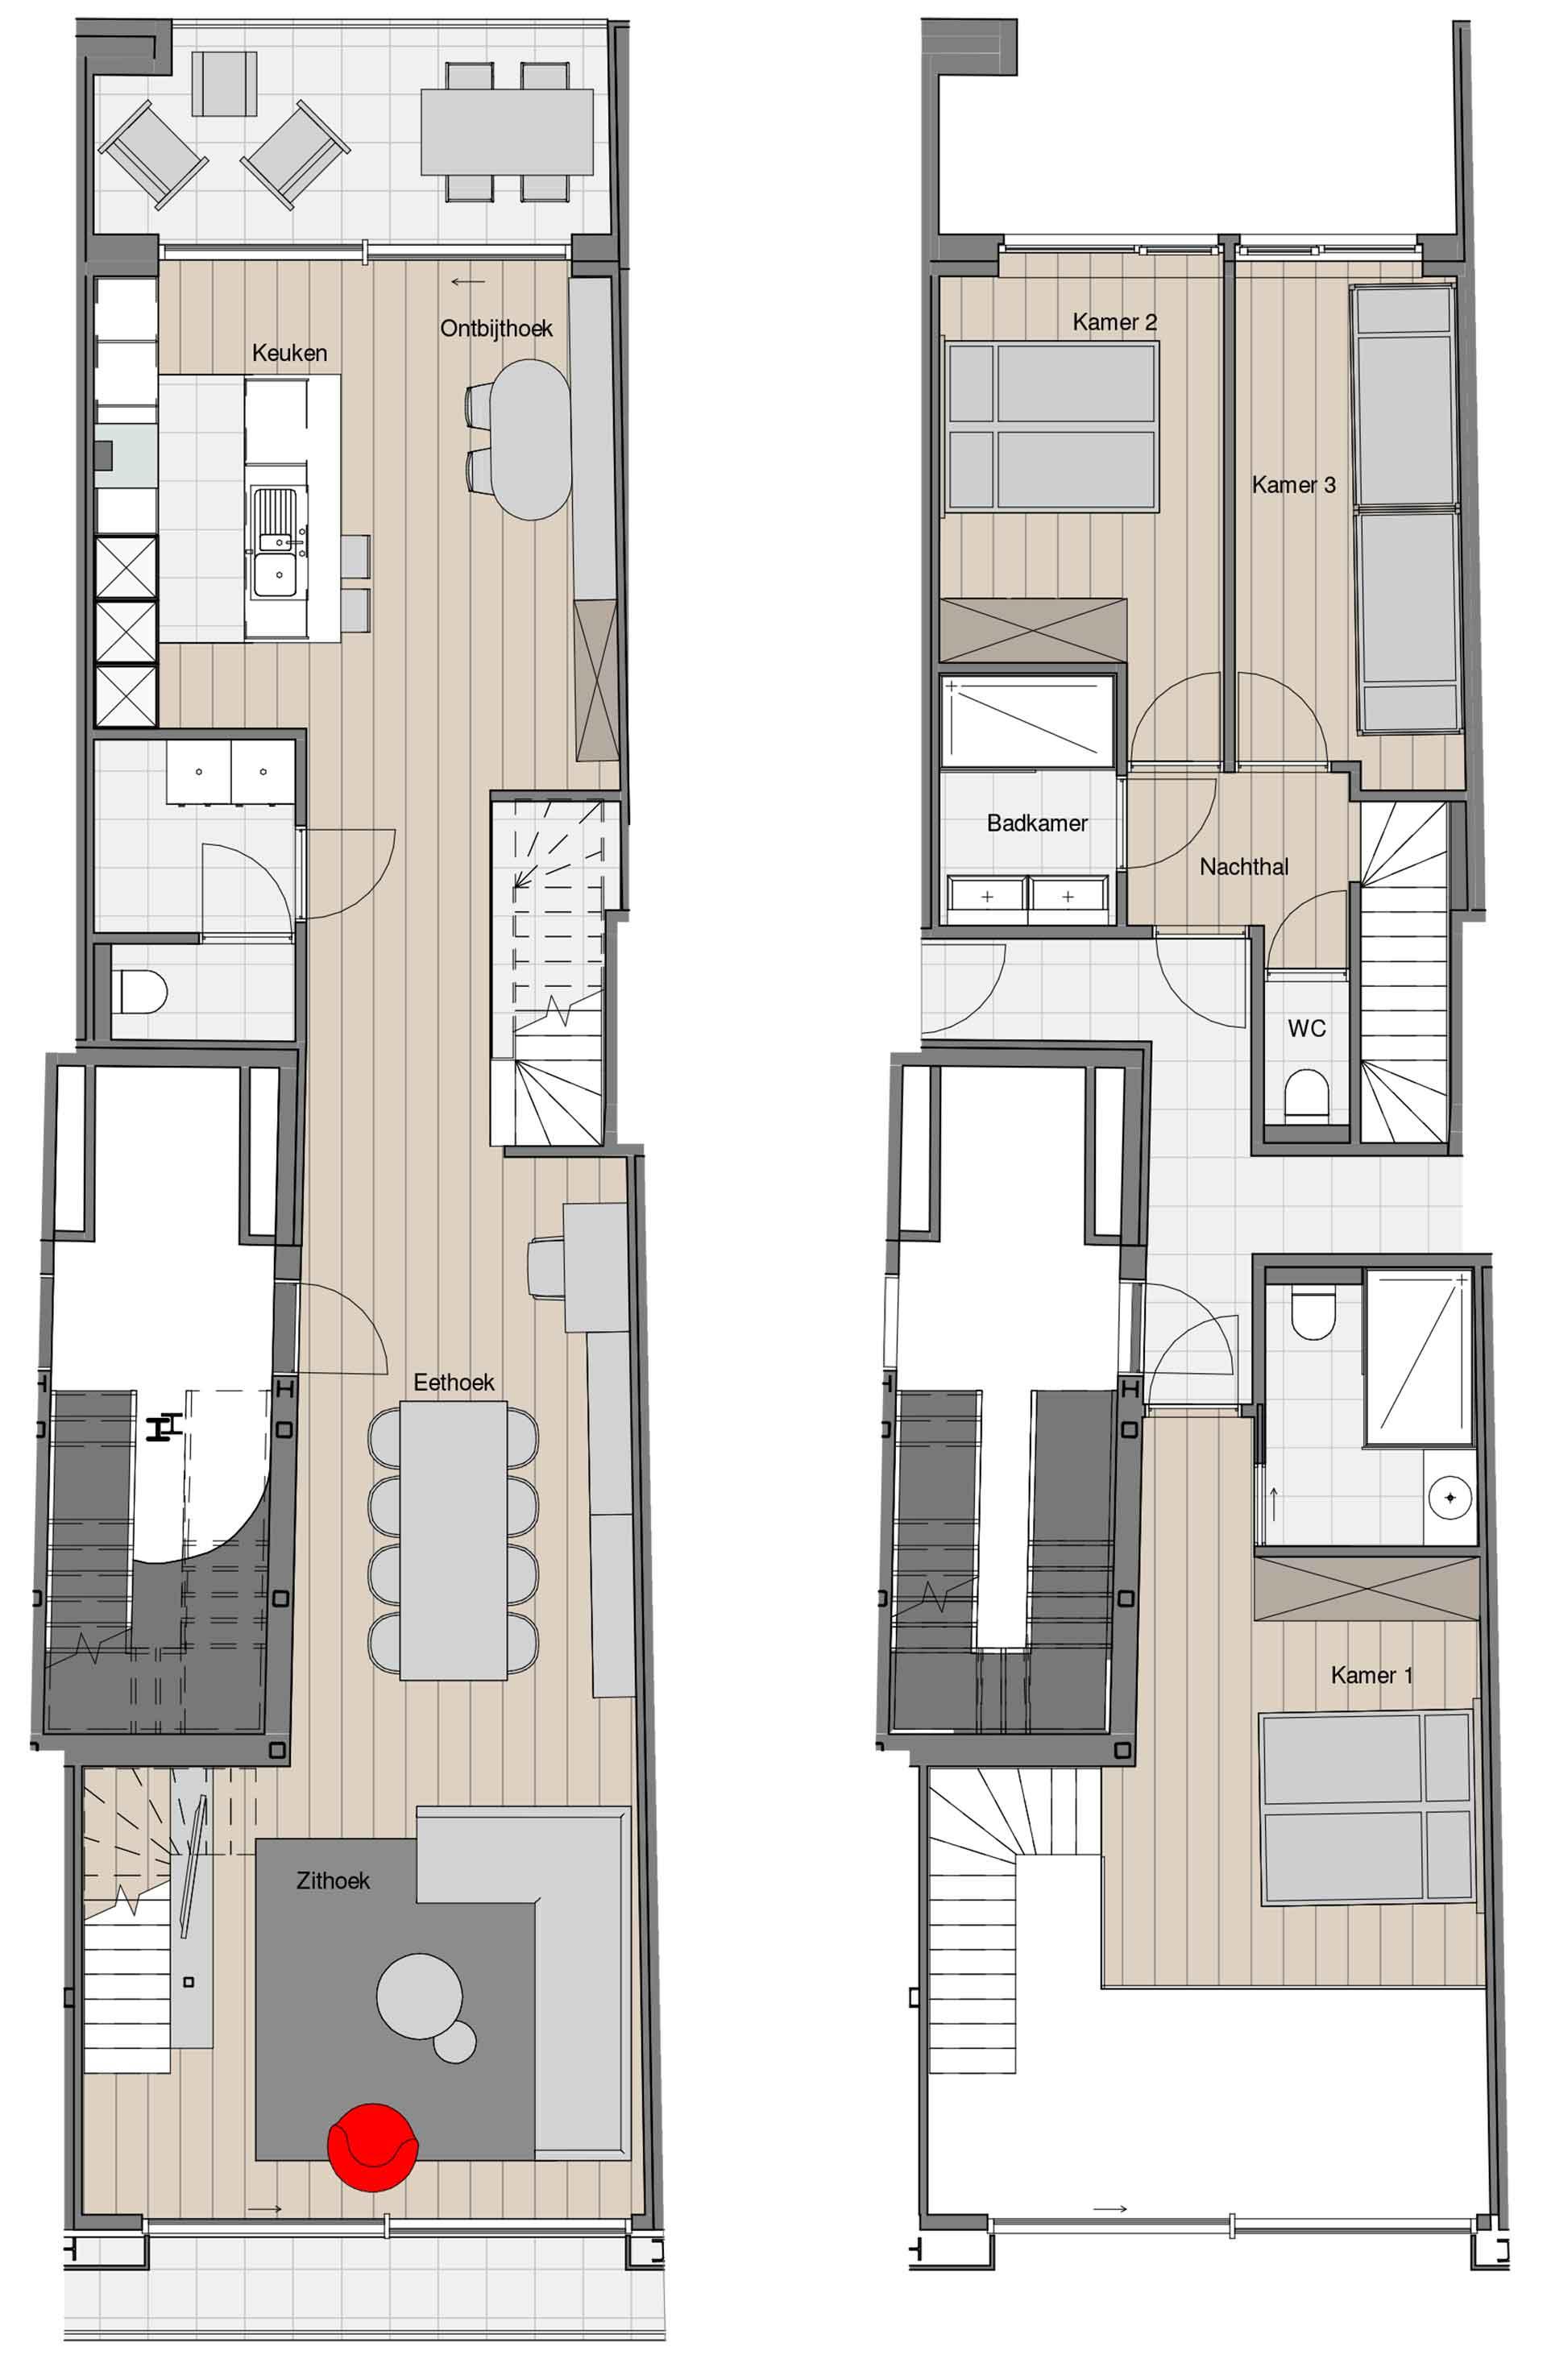 Residentie <br/> Louise - image appartement-te-koop-knokke-residentie-louise-mezzanine-507-72 on https://hoprom.be